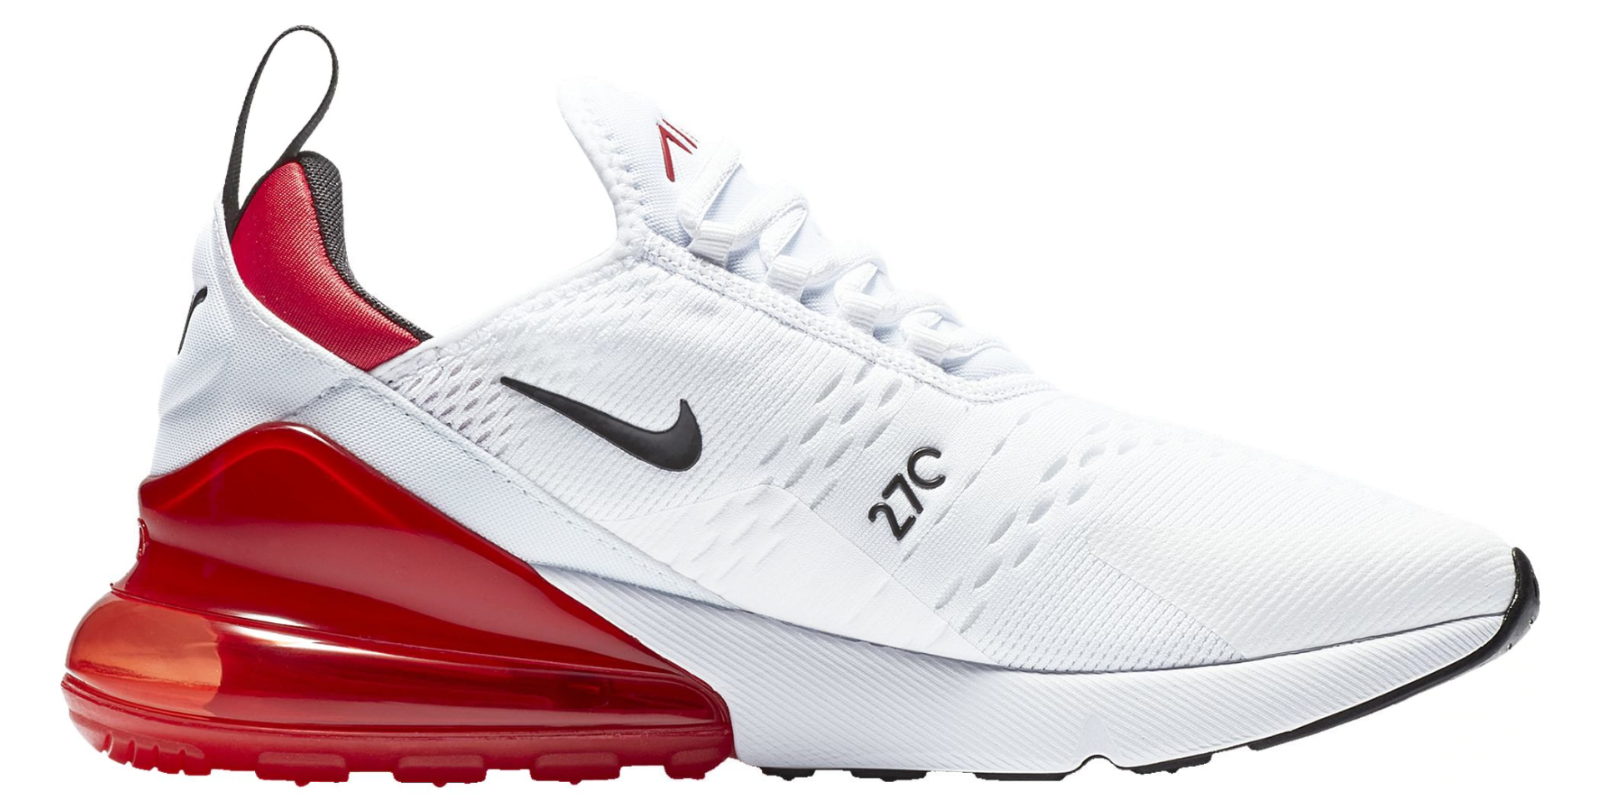 the latest eb8dc 3a351 Hombre Auténtico Nike Air Max 270 Zapatos Tallas 8-14 -  169.83